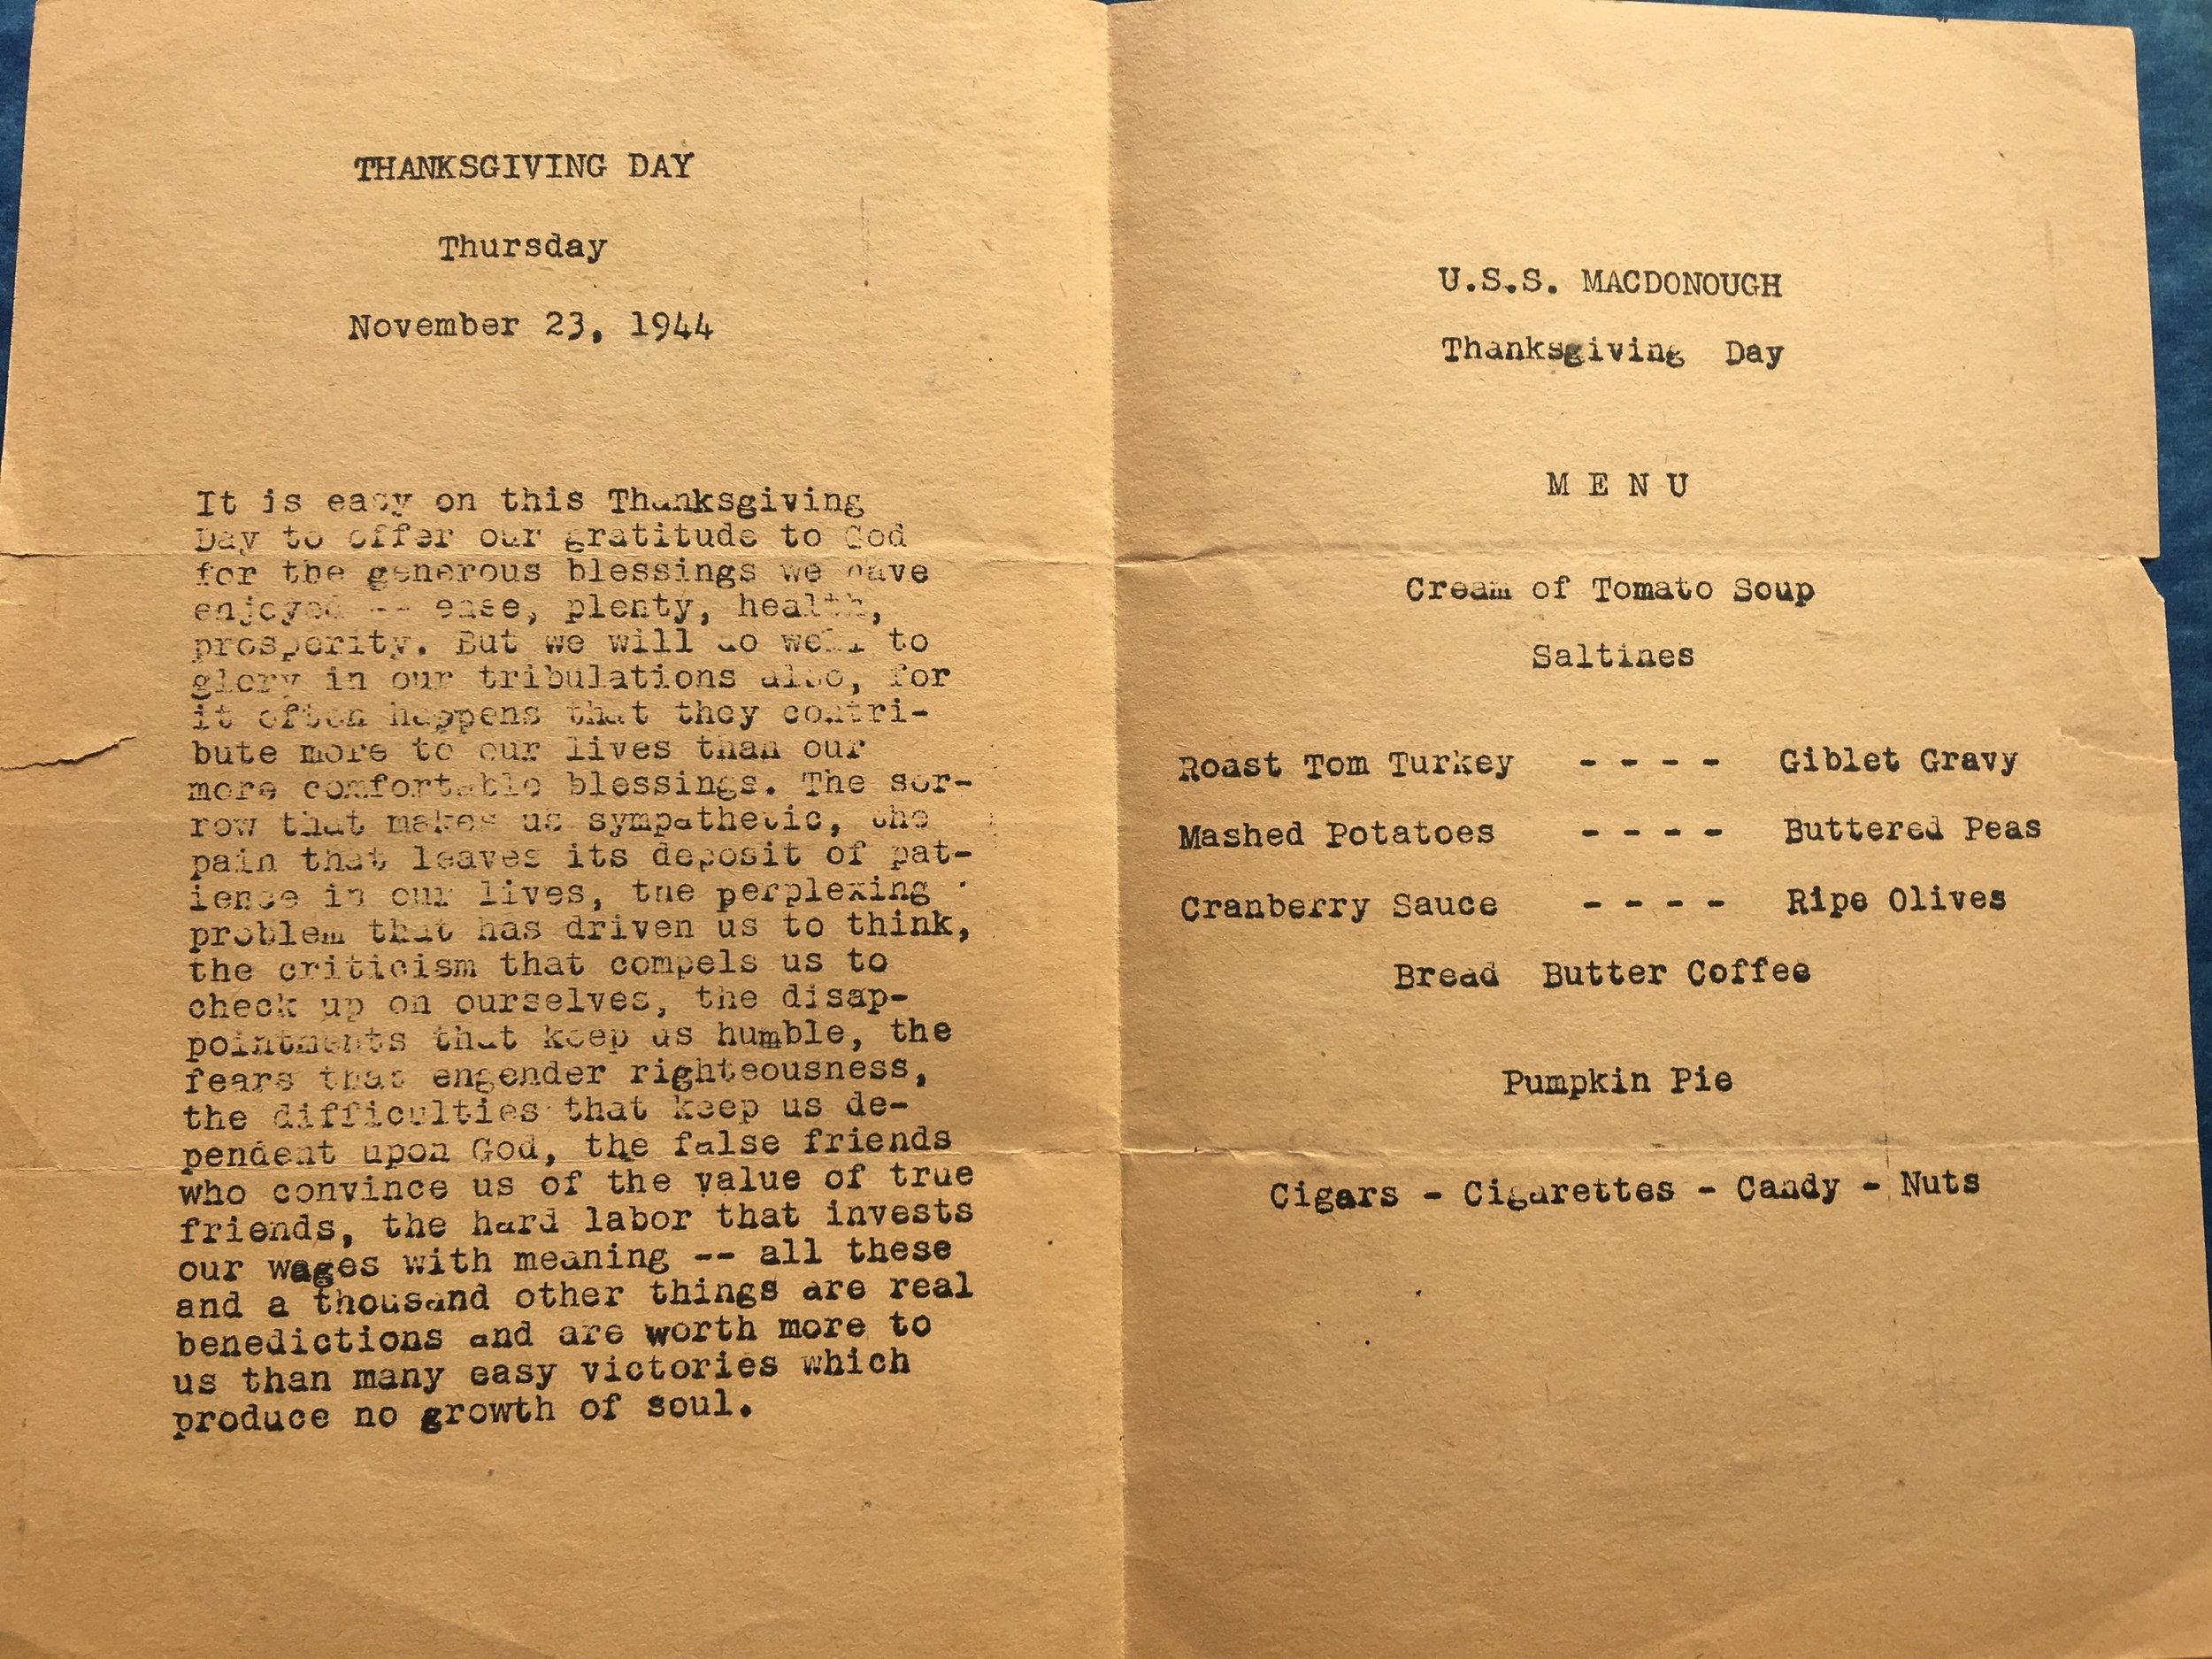 Inside of menu on U.S.S. MacDonough.